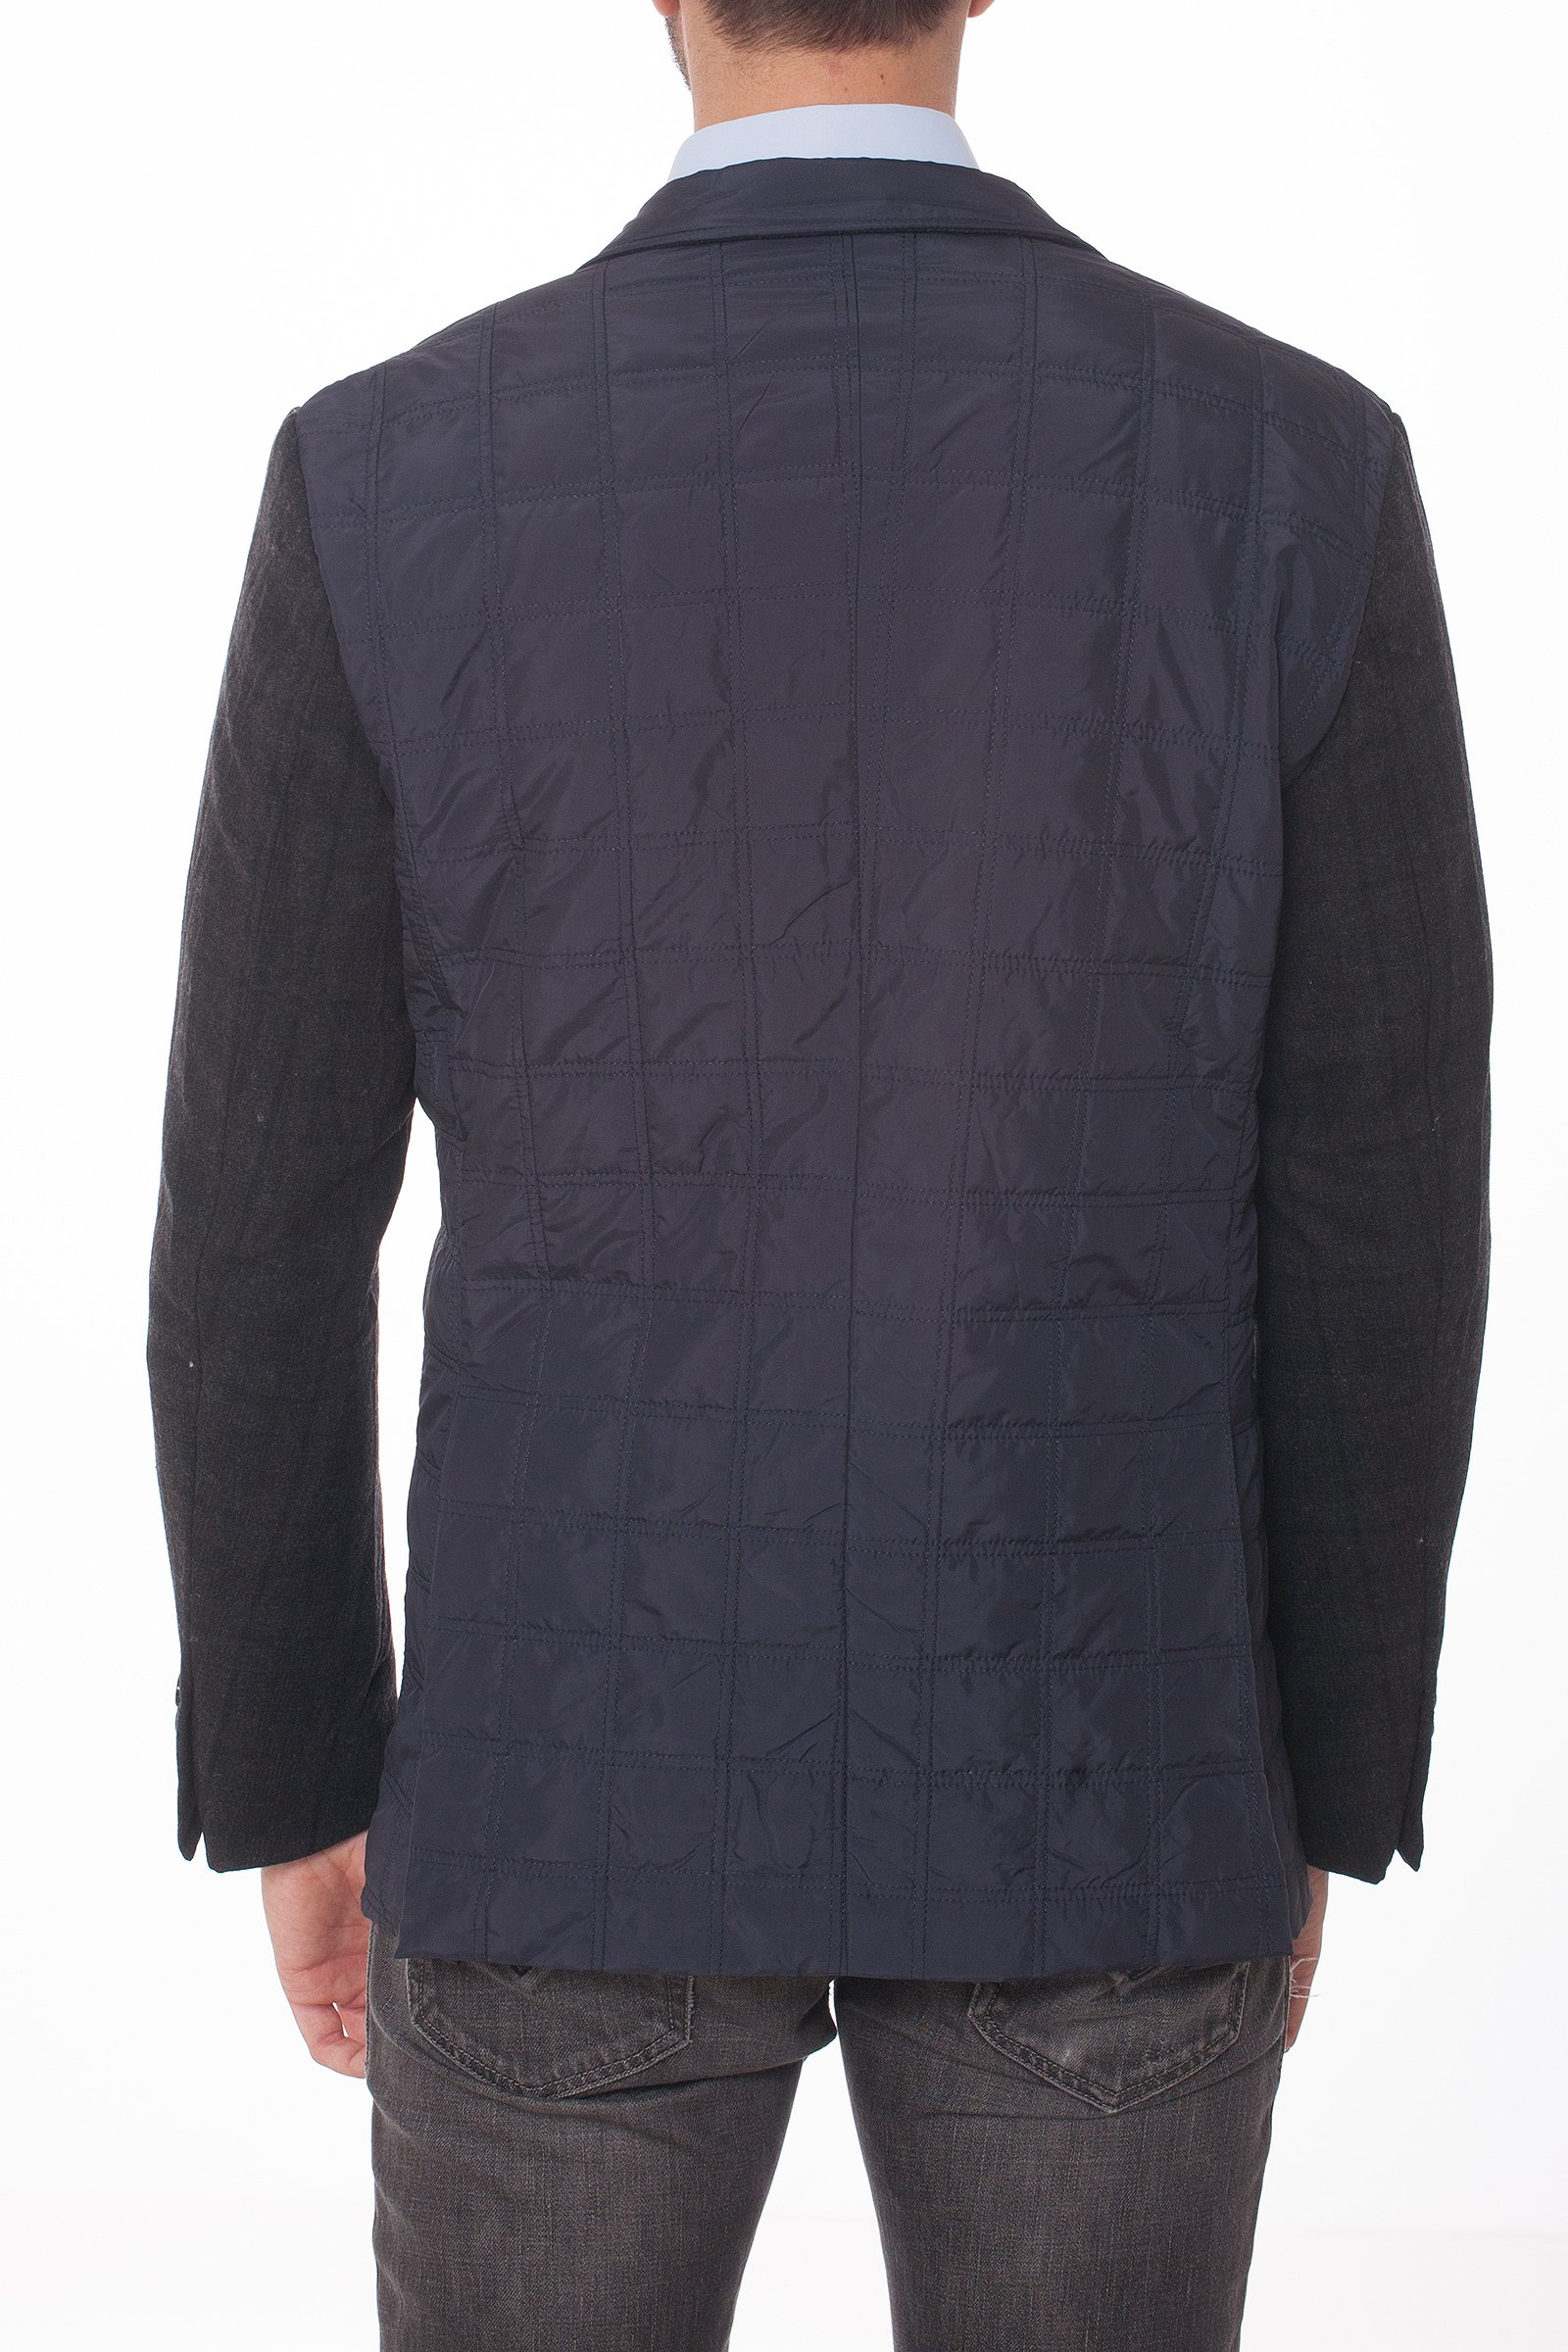 Geaca matlasata tip sacou cu maneci negre in carouri din lana